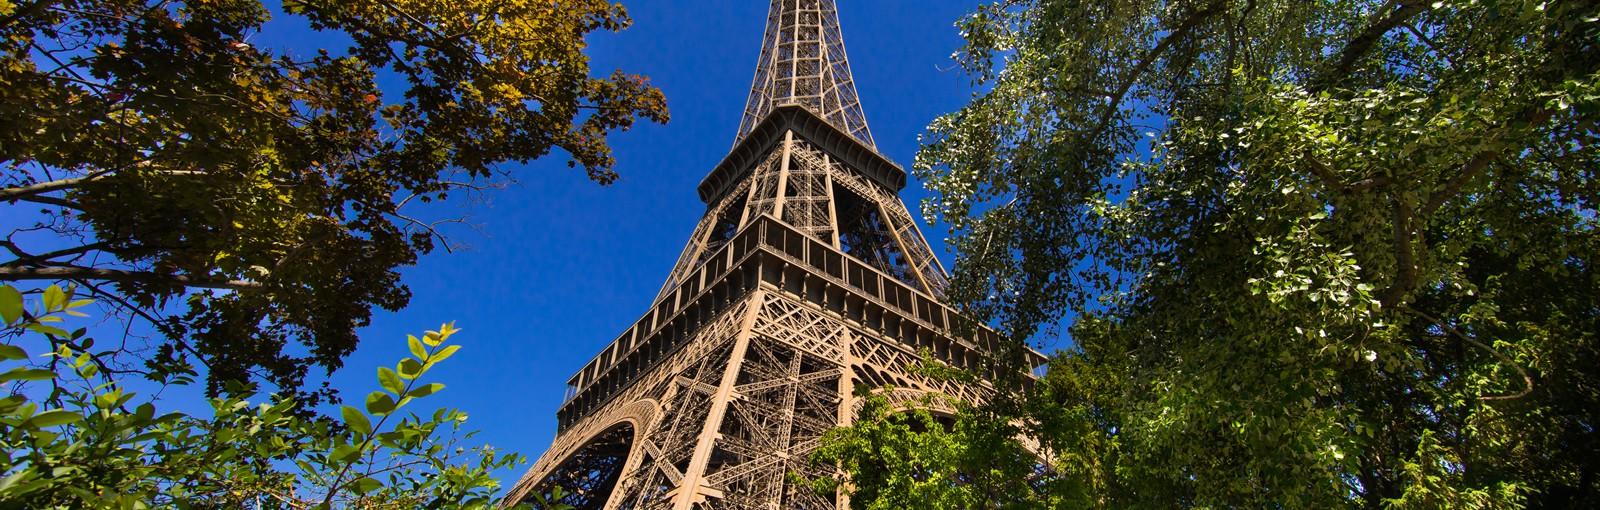 Tours 巴黎和凡尔赛宫一日游 - 巴黎市区游 - 巴黎游